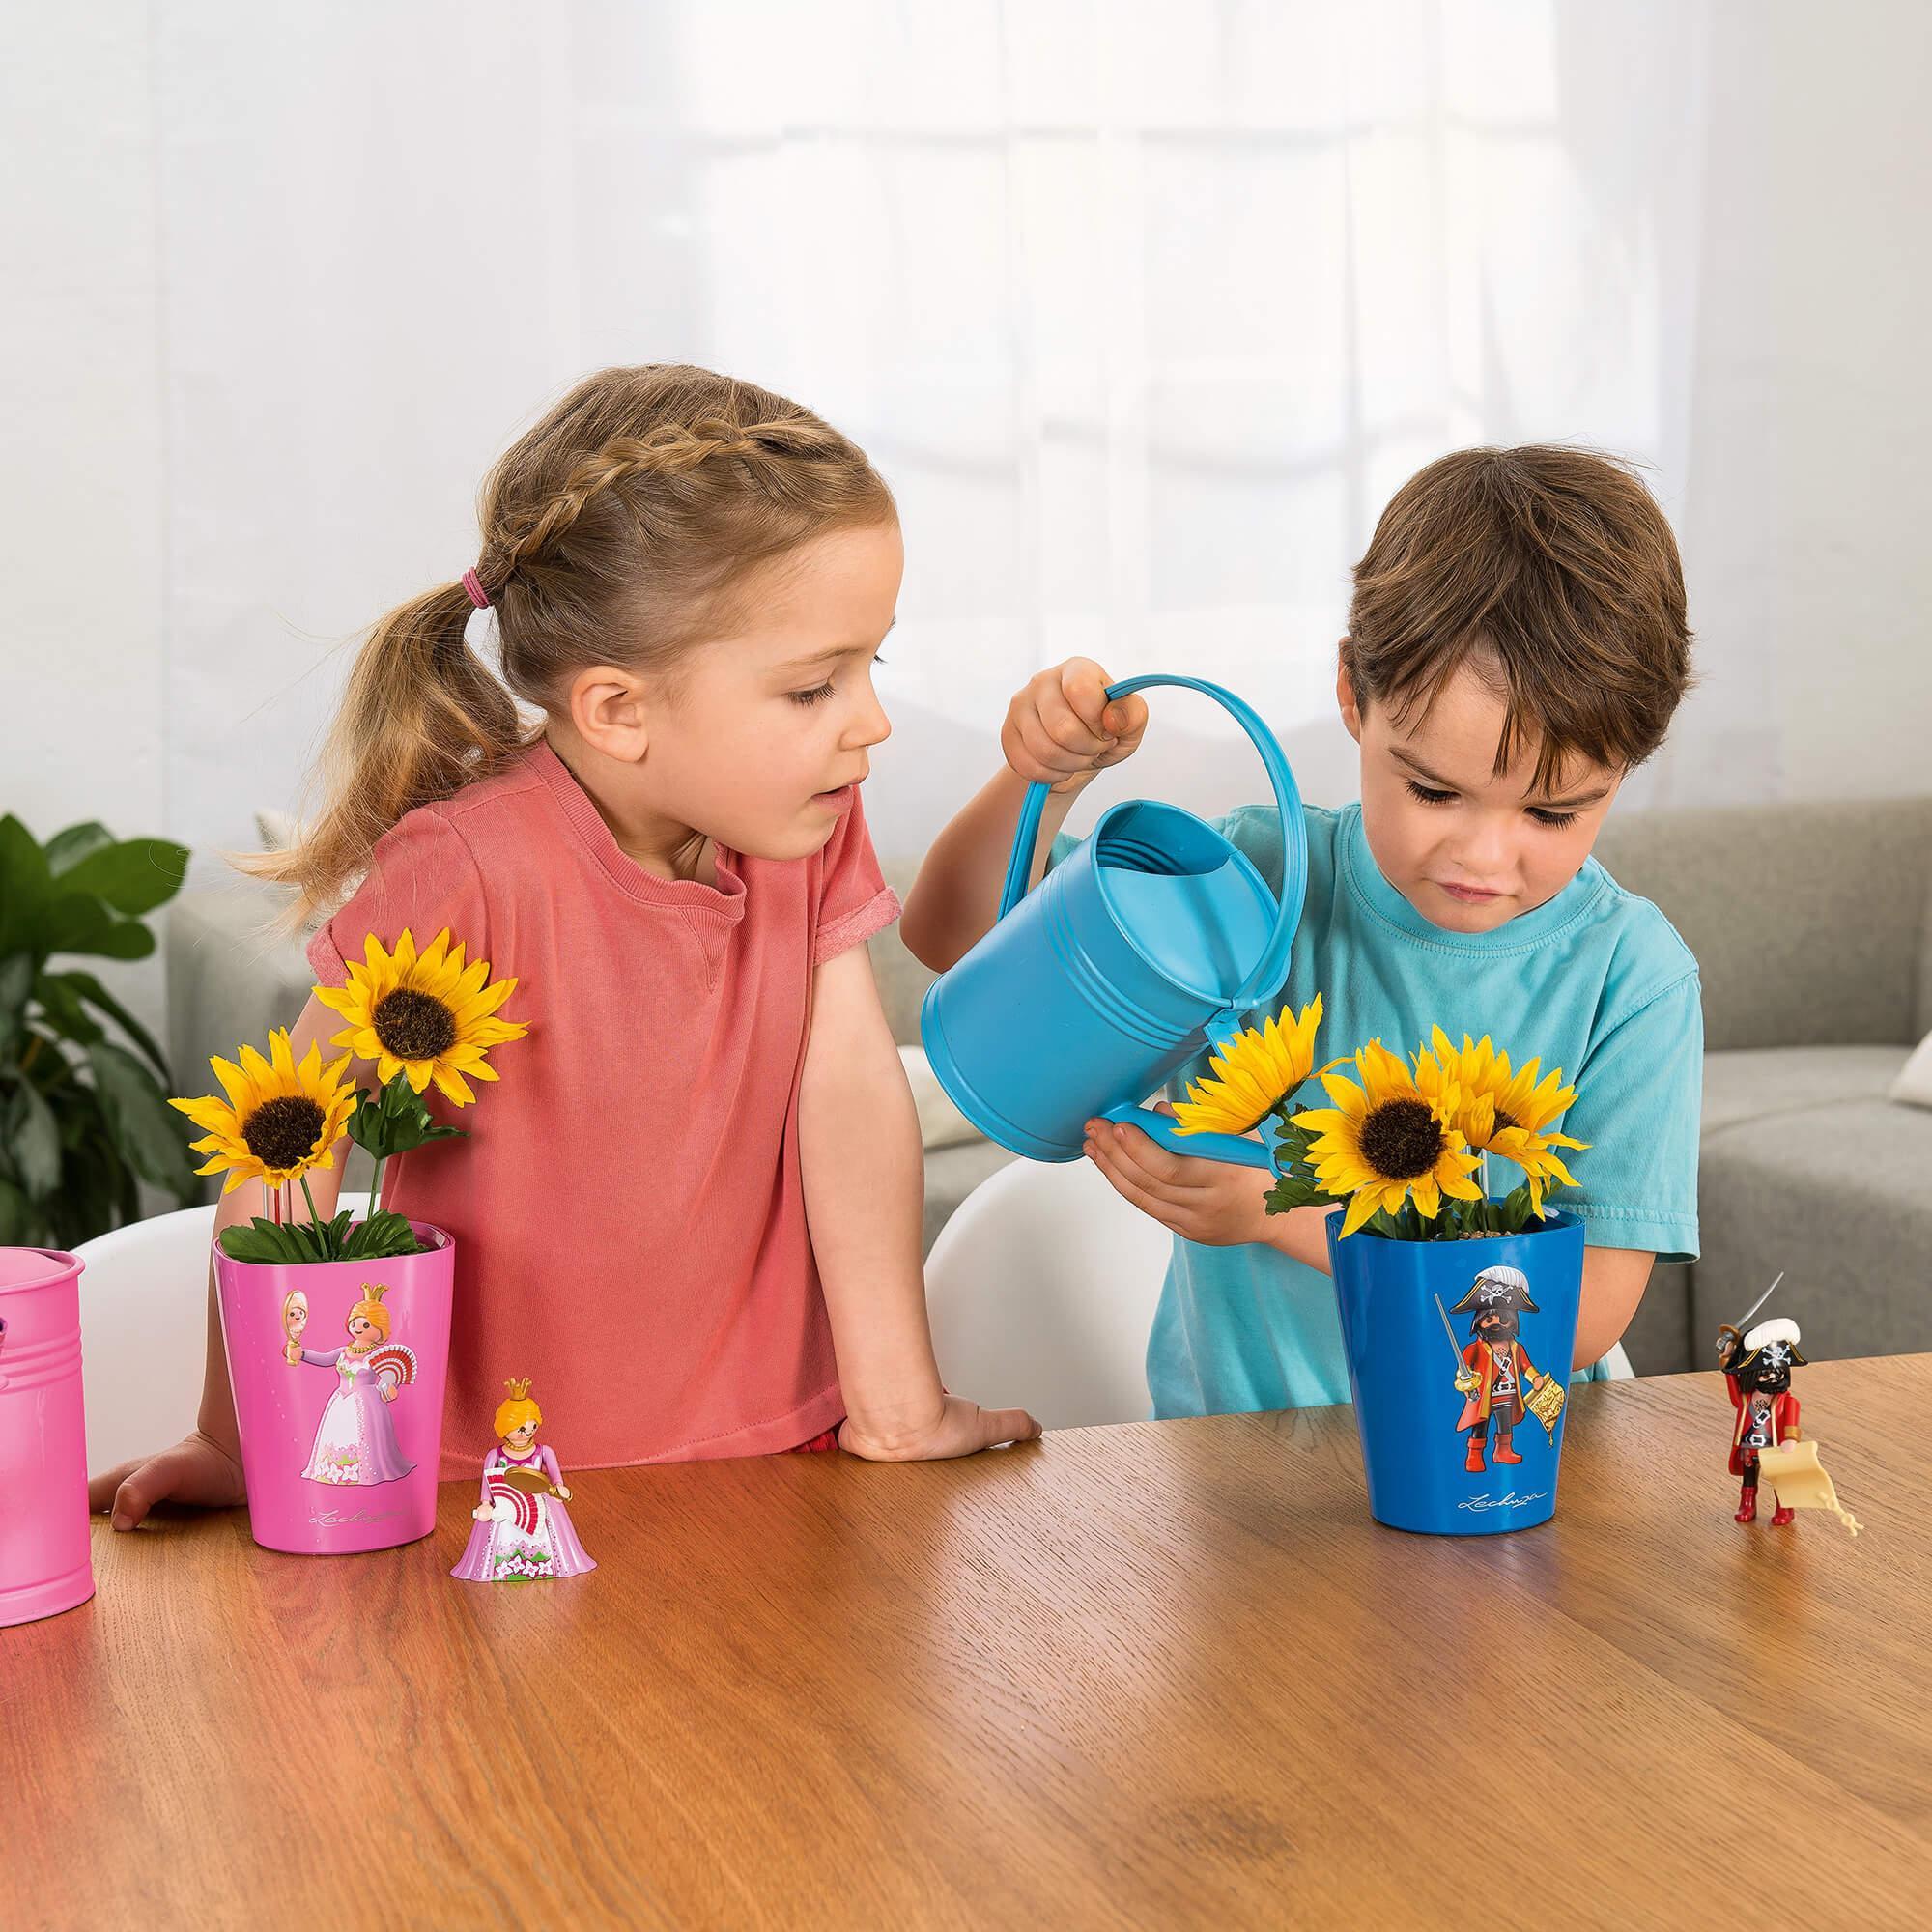 le_starter-set-fuer-kids_product_addi_05